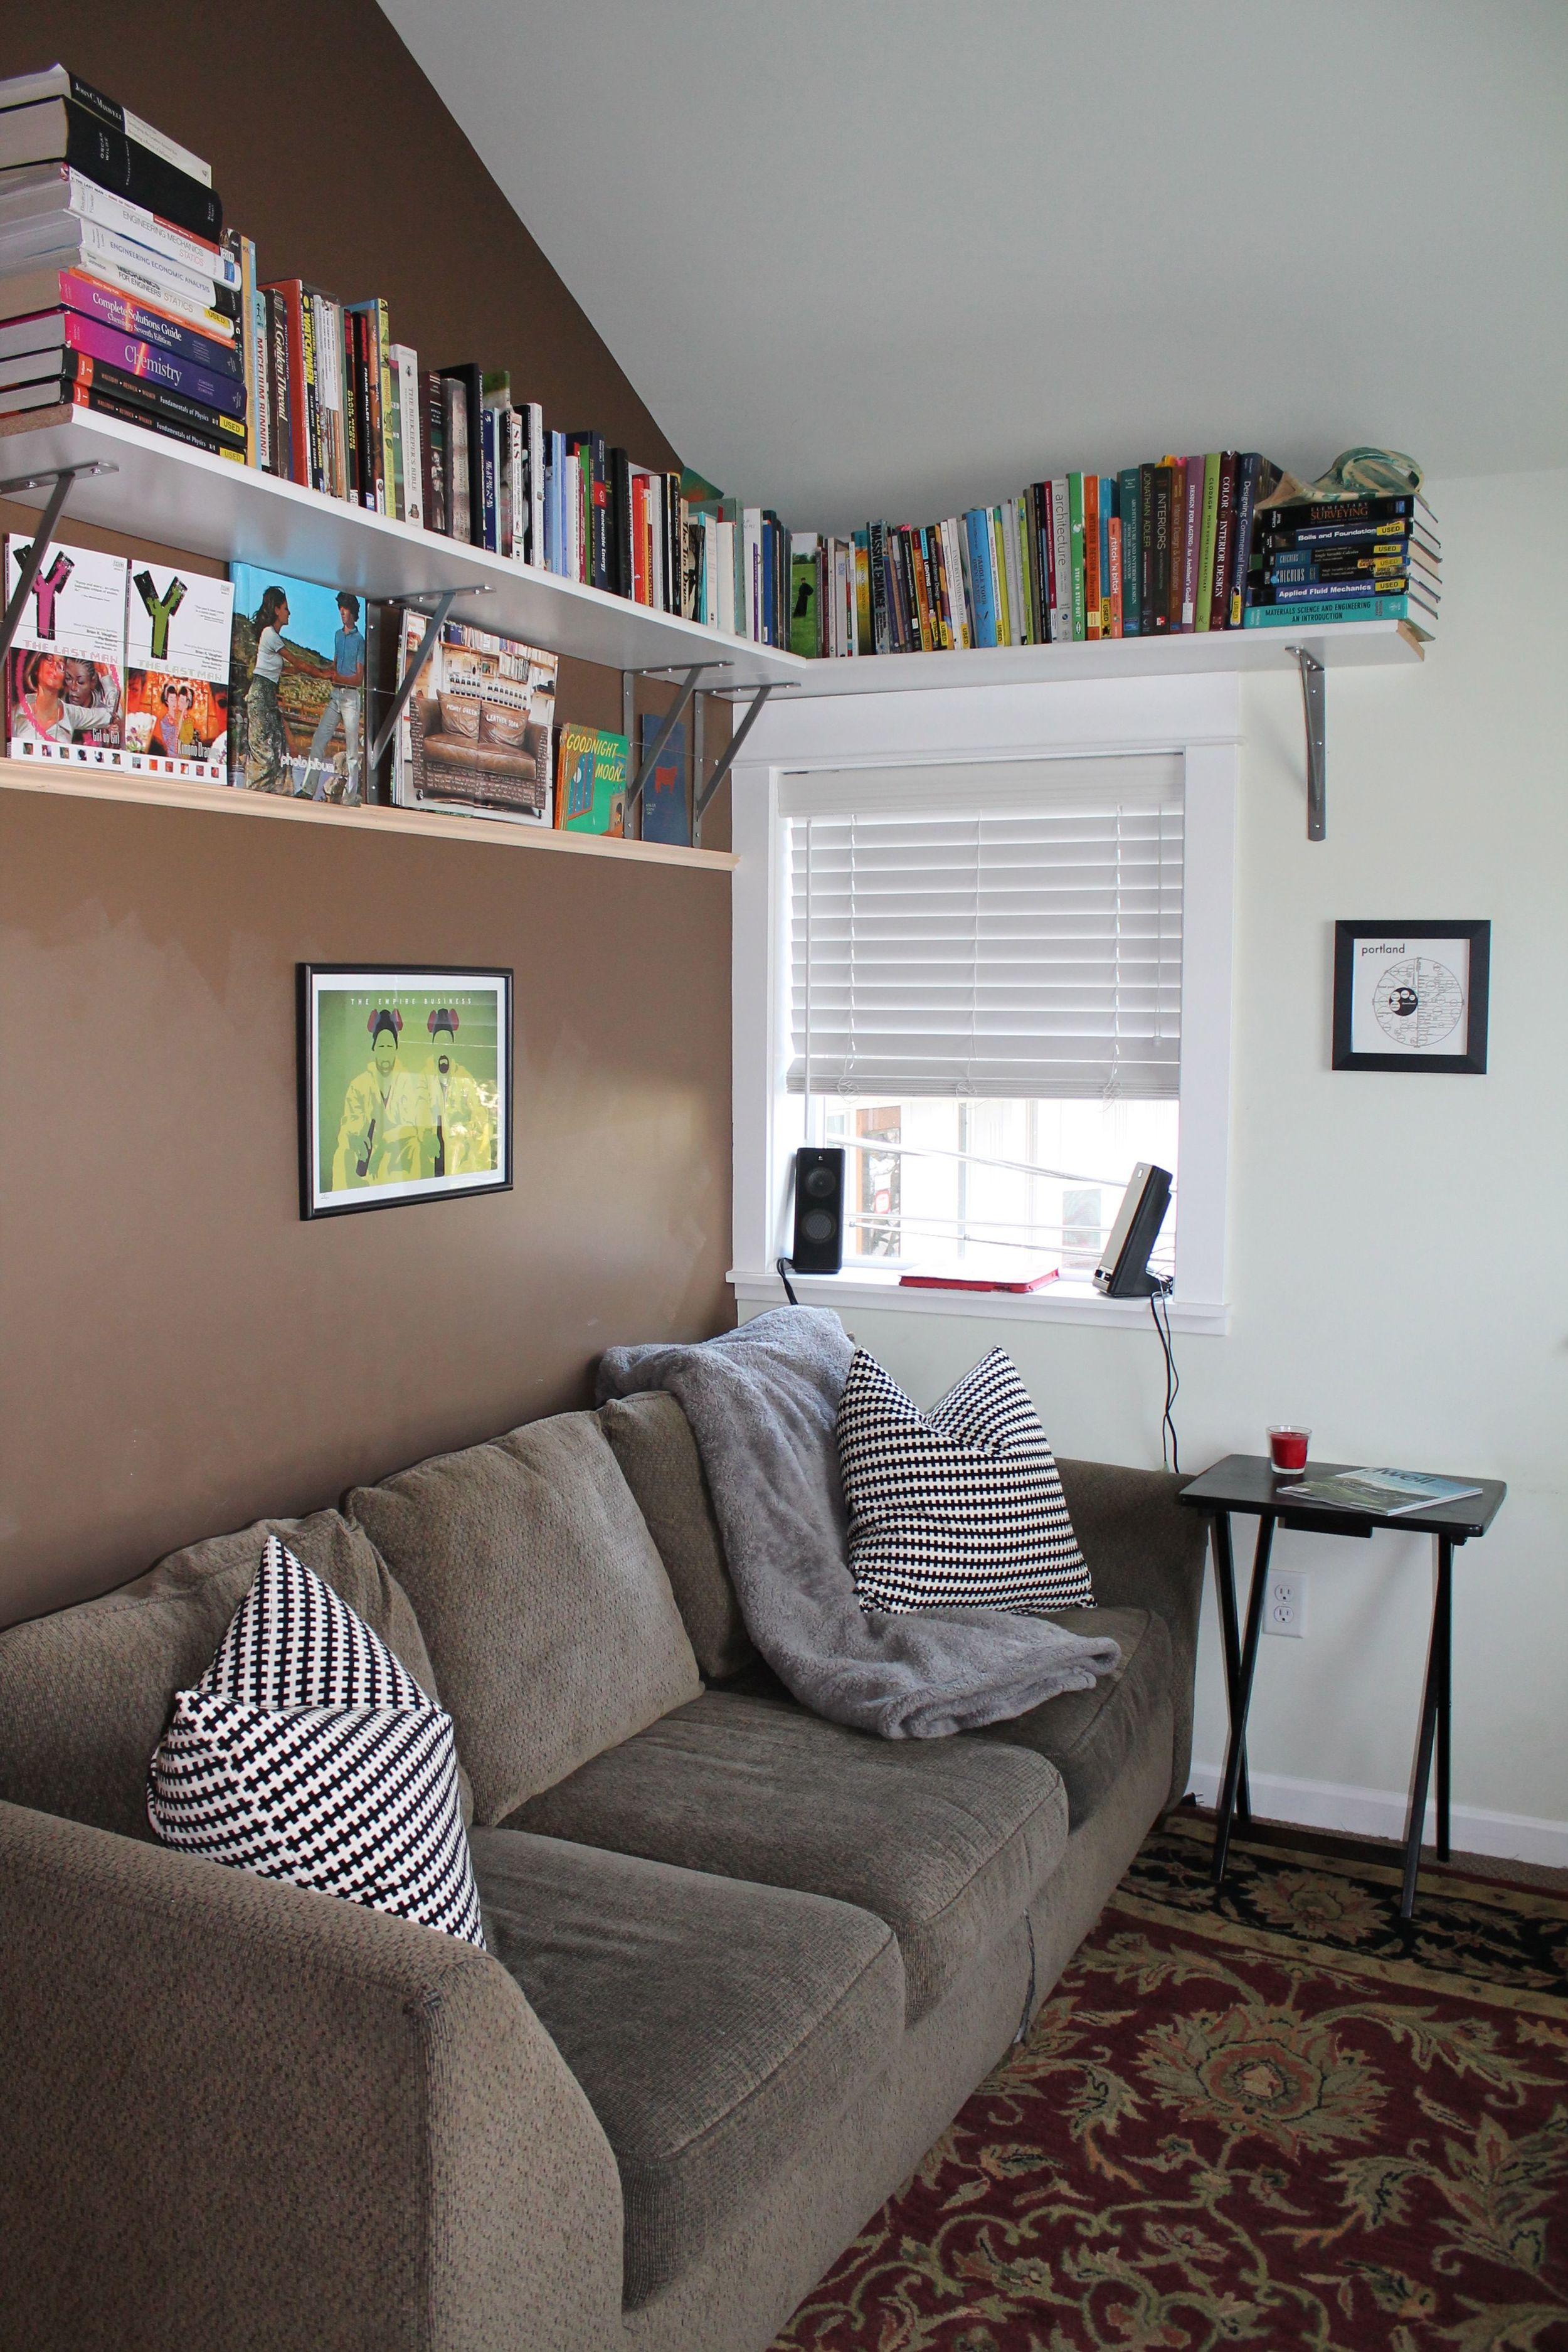 bookshelf ideas, awesome DIY ideas for bookshelves, creative bookshelf ideas